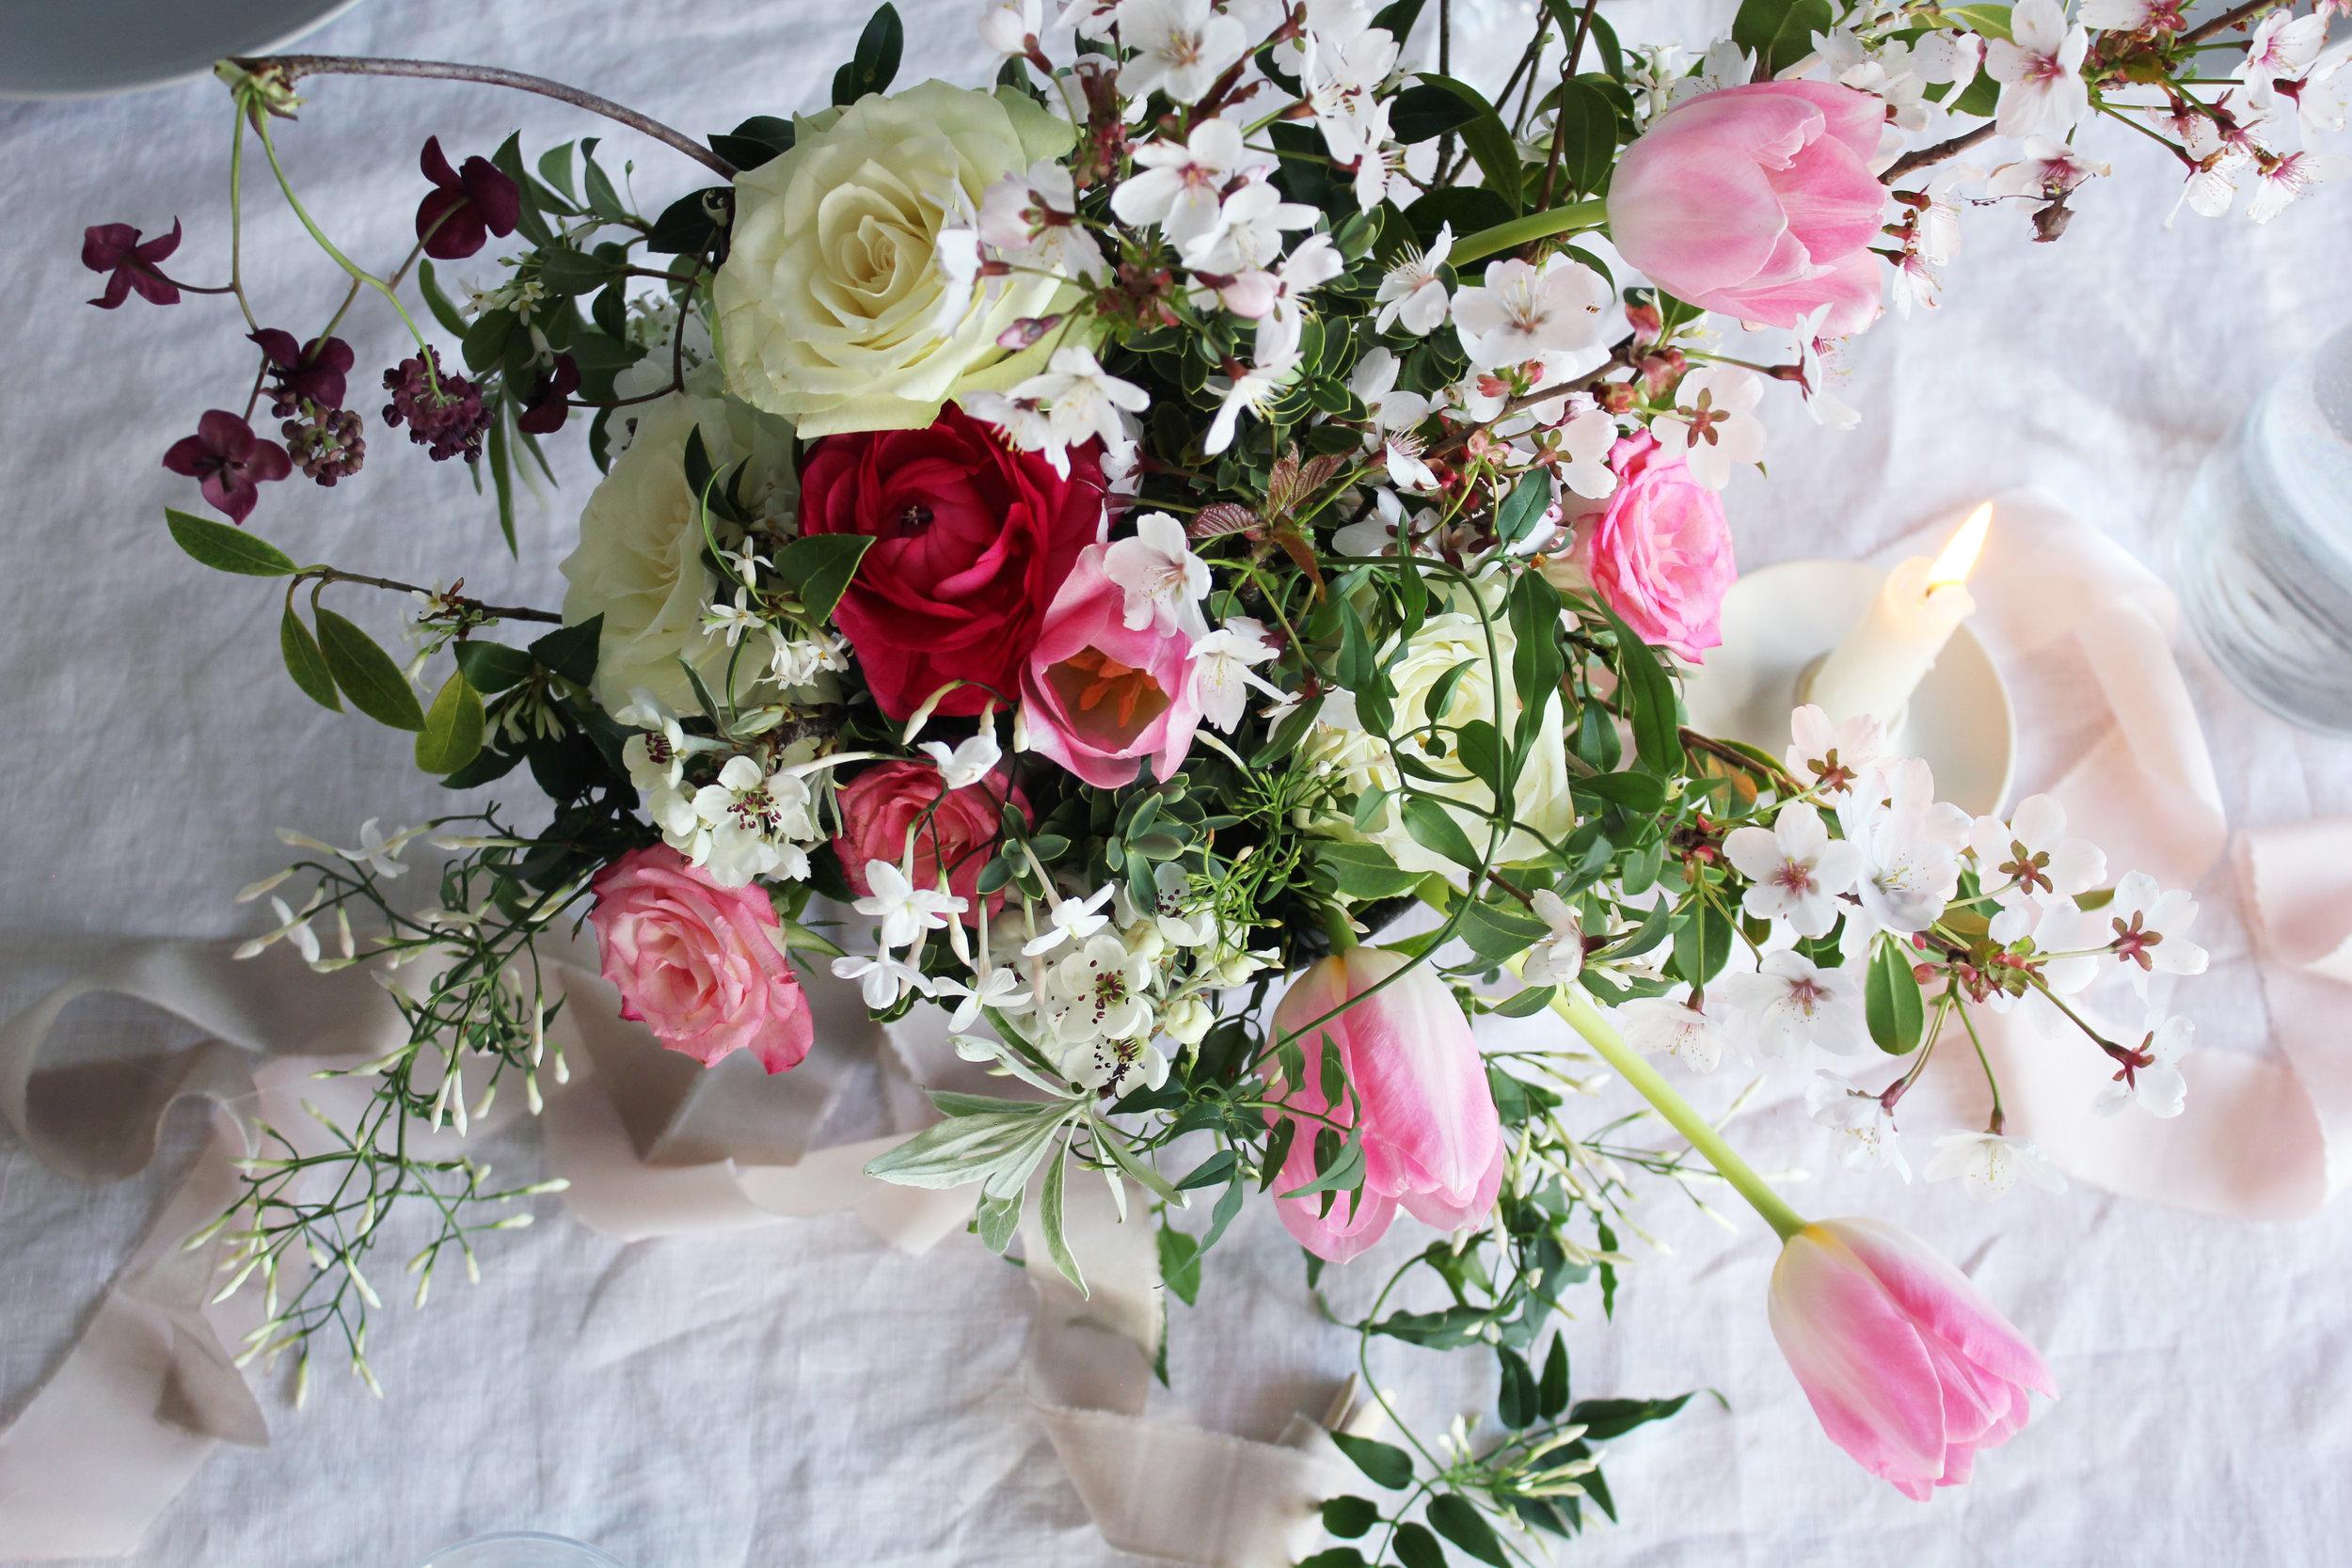 Callie-Pettigrew-Springtime-Wedding-11.jpg